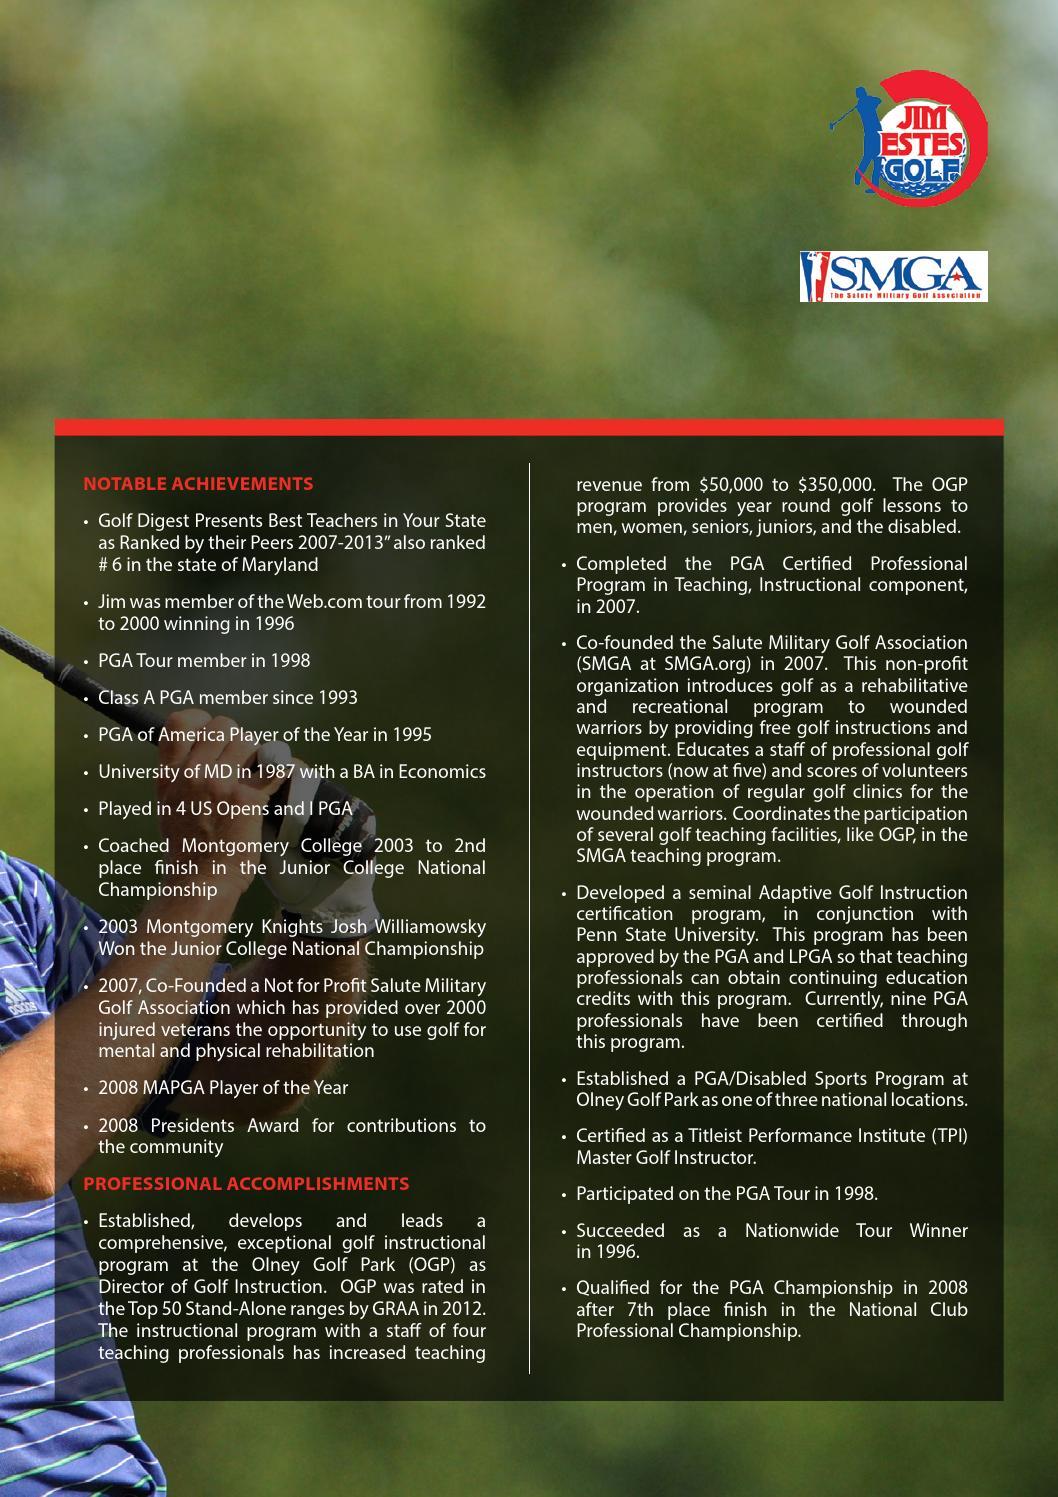 Msga Magazine Issue 5 Nov 2013 By Think Sports Media Llc Issuu